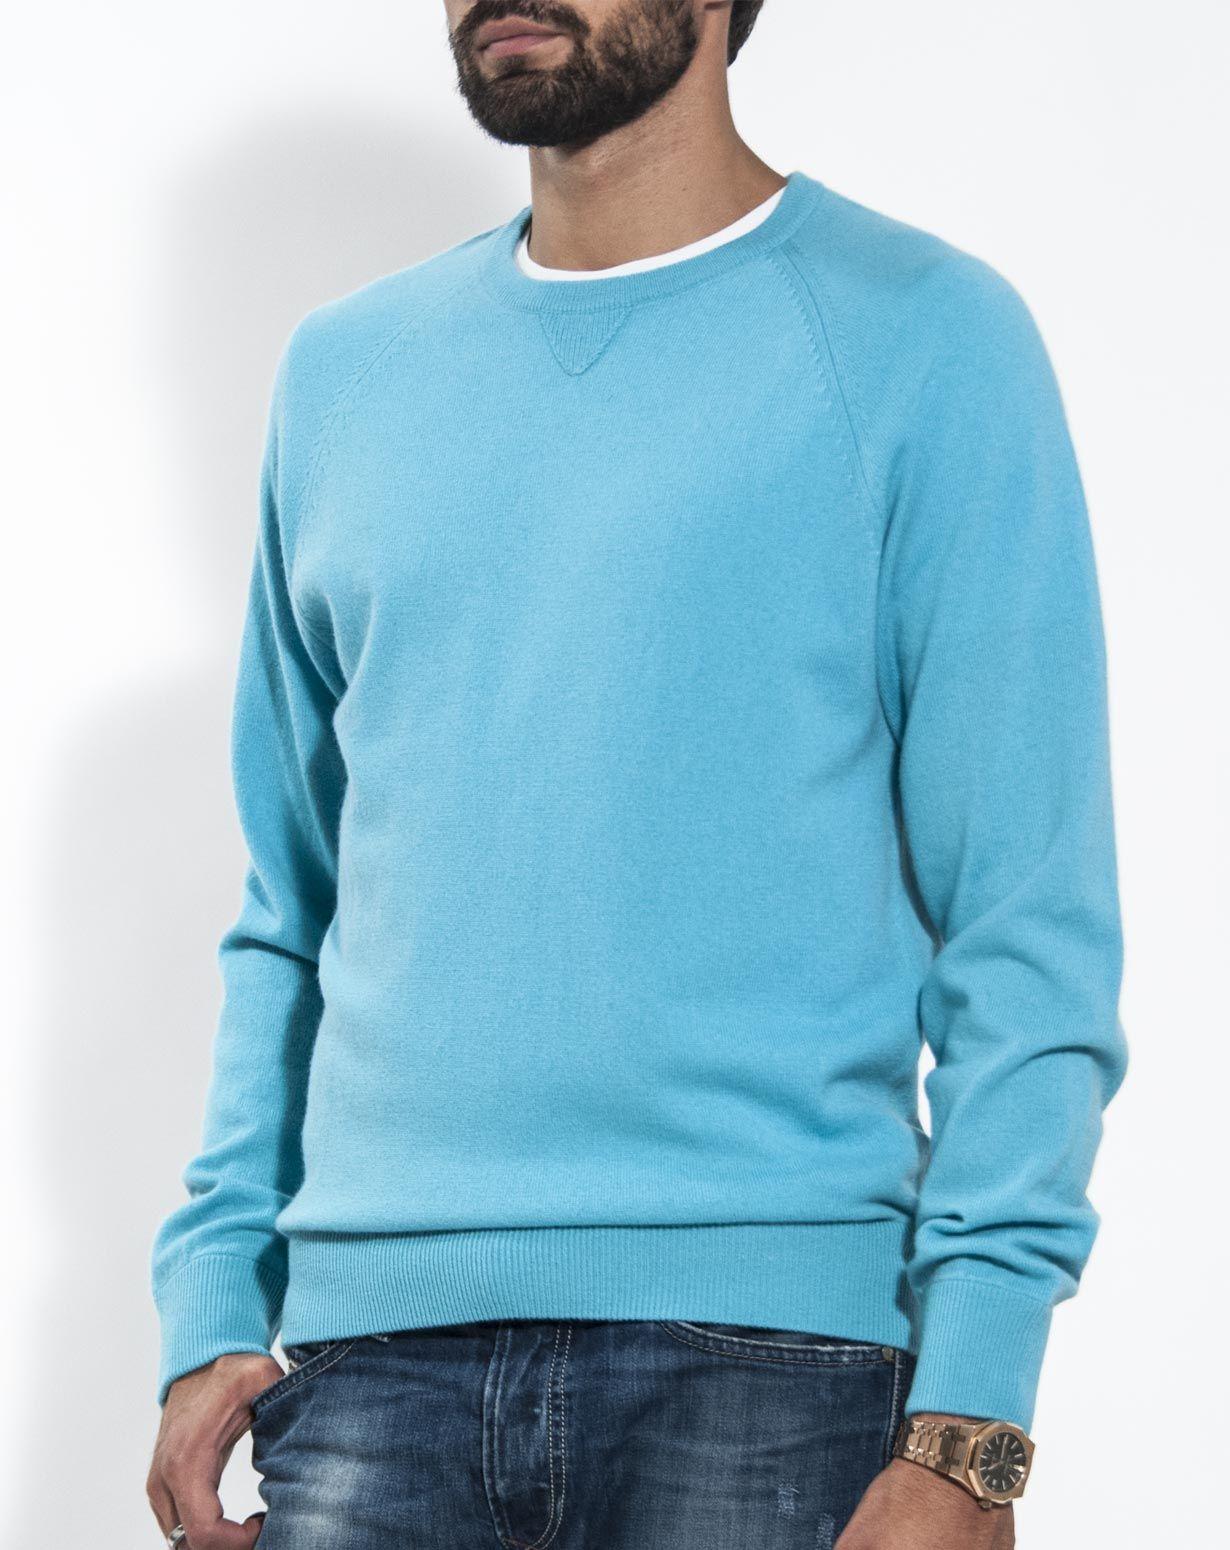 Men S Pure Cashmere Sweatshirt Pure Cashmere Mens Sweatshirts Men Sweater [ 1550 x 1230 Pixel ]